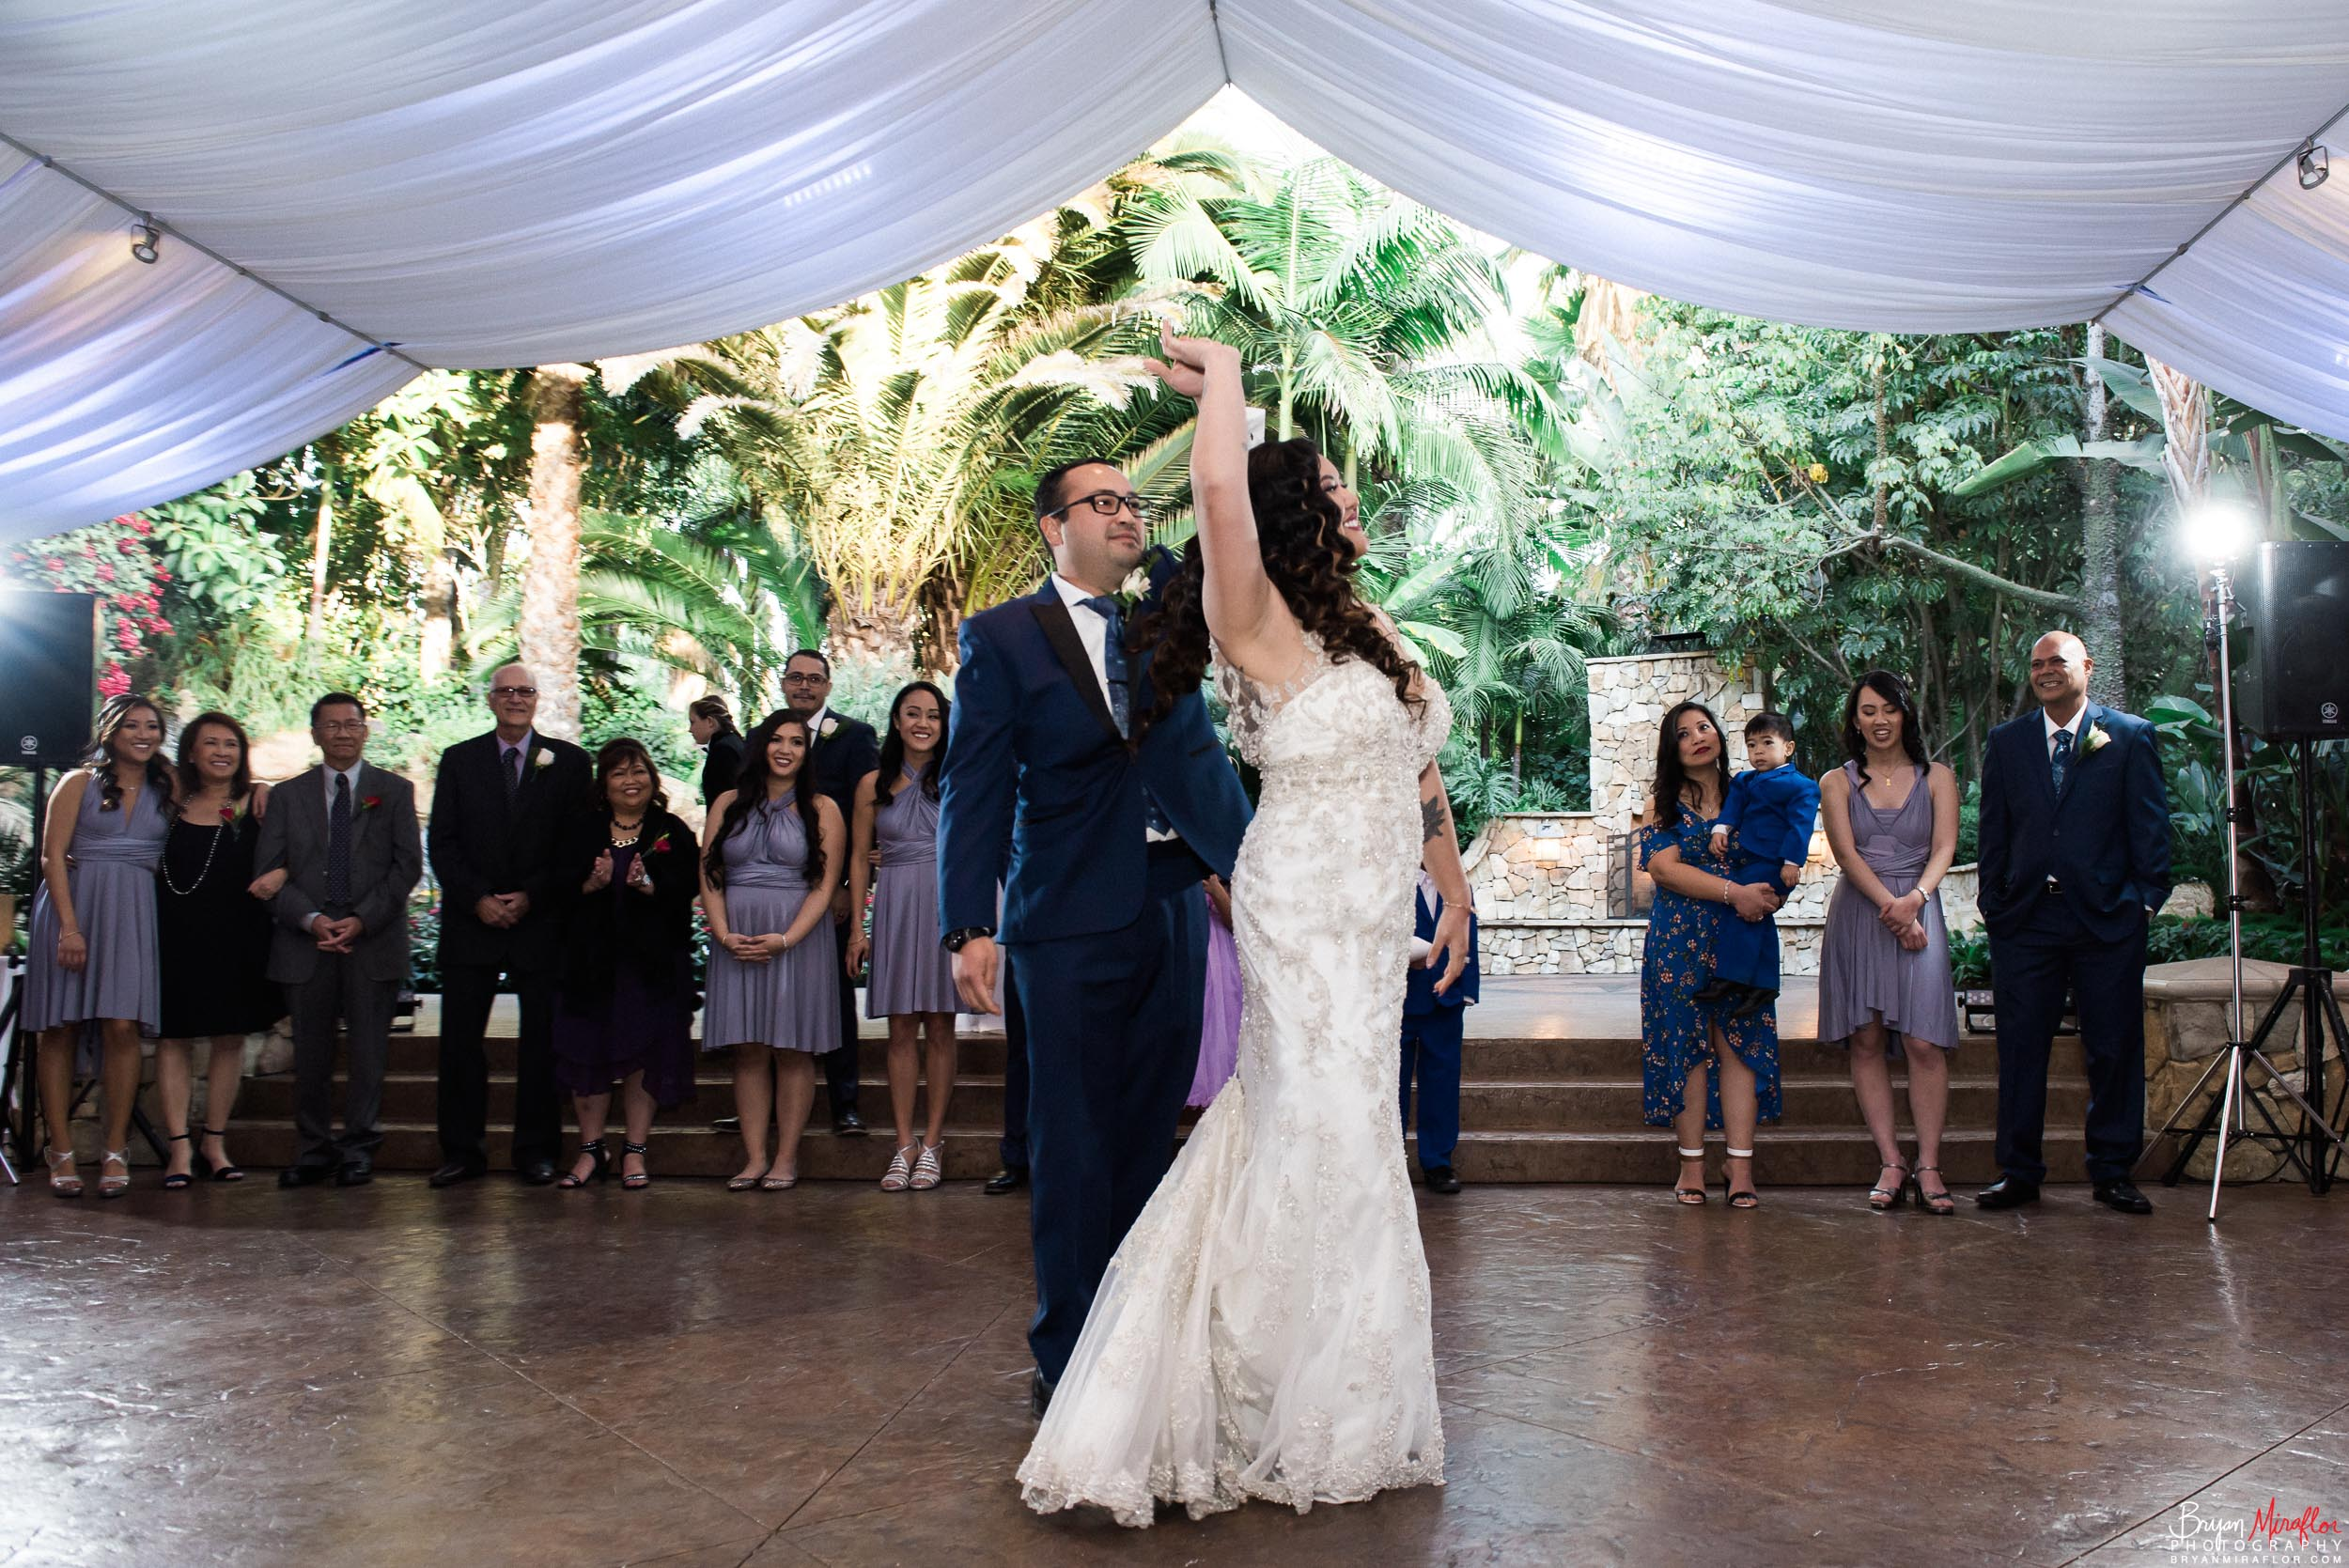 Bryan-Miraflor-Photography-Hannah-Jonathan-Married-Grand-Traditions-Estate-Gardens-Fallbrook-20171222-180.jpg